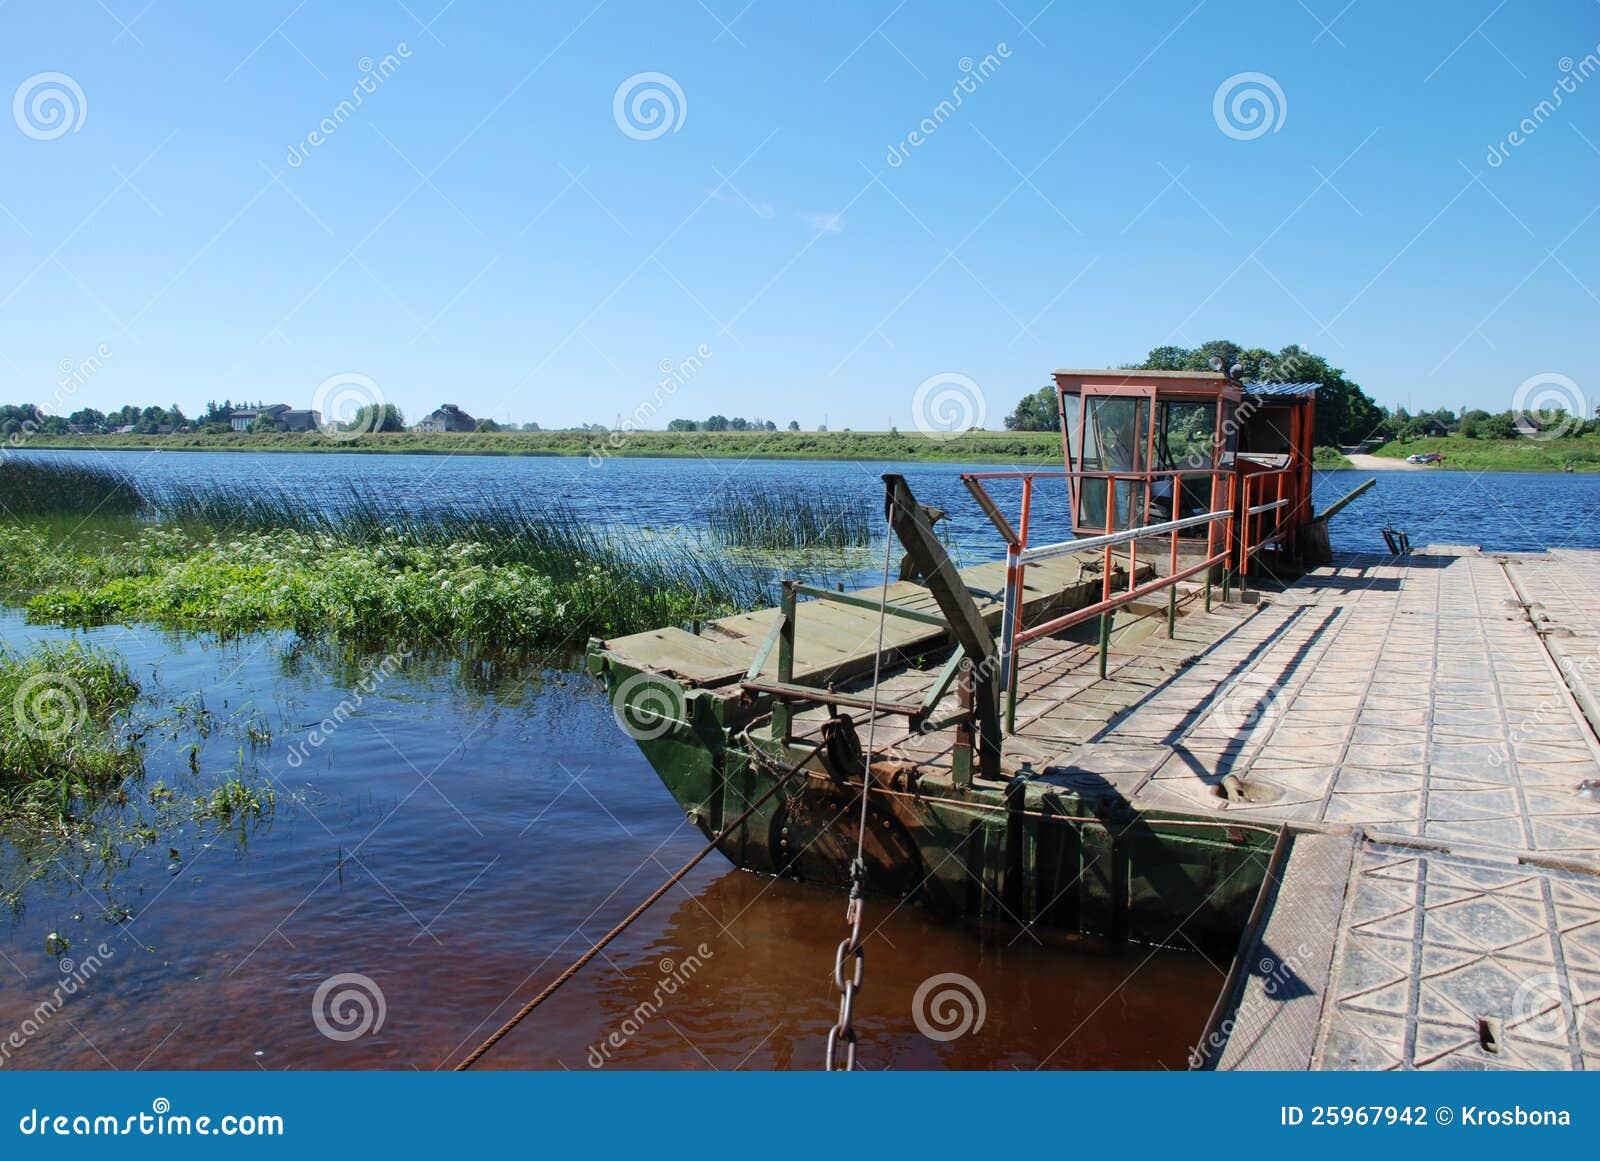 Ferry crosses a Daugava river